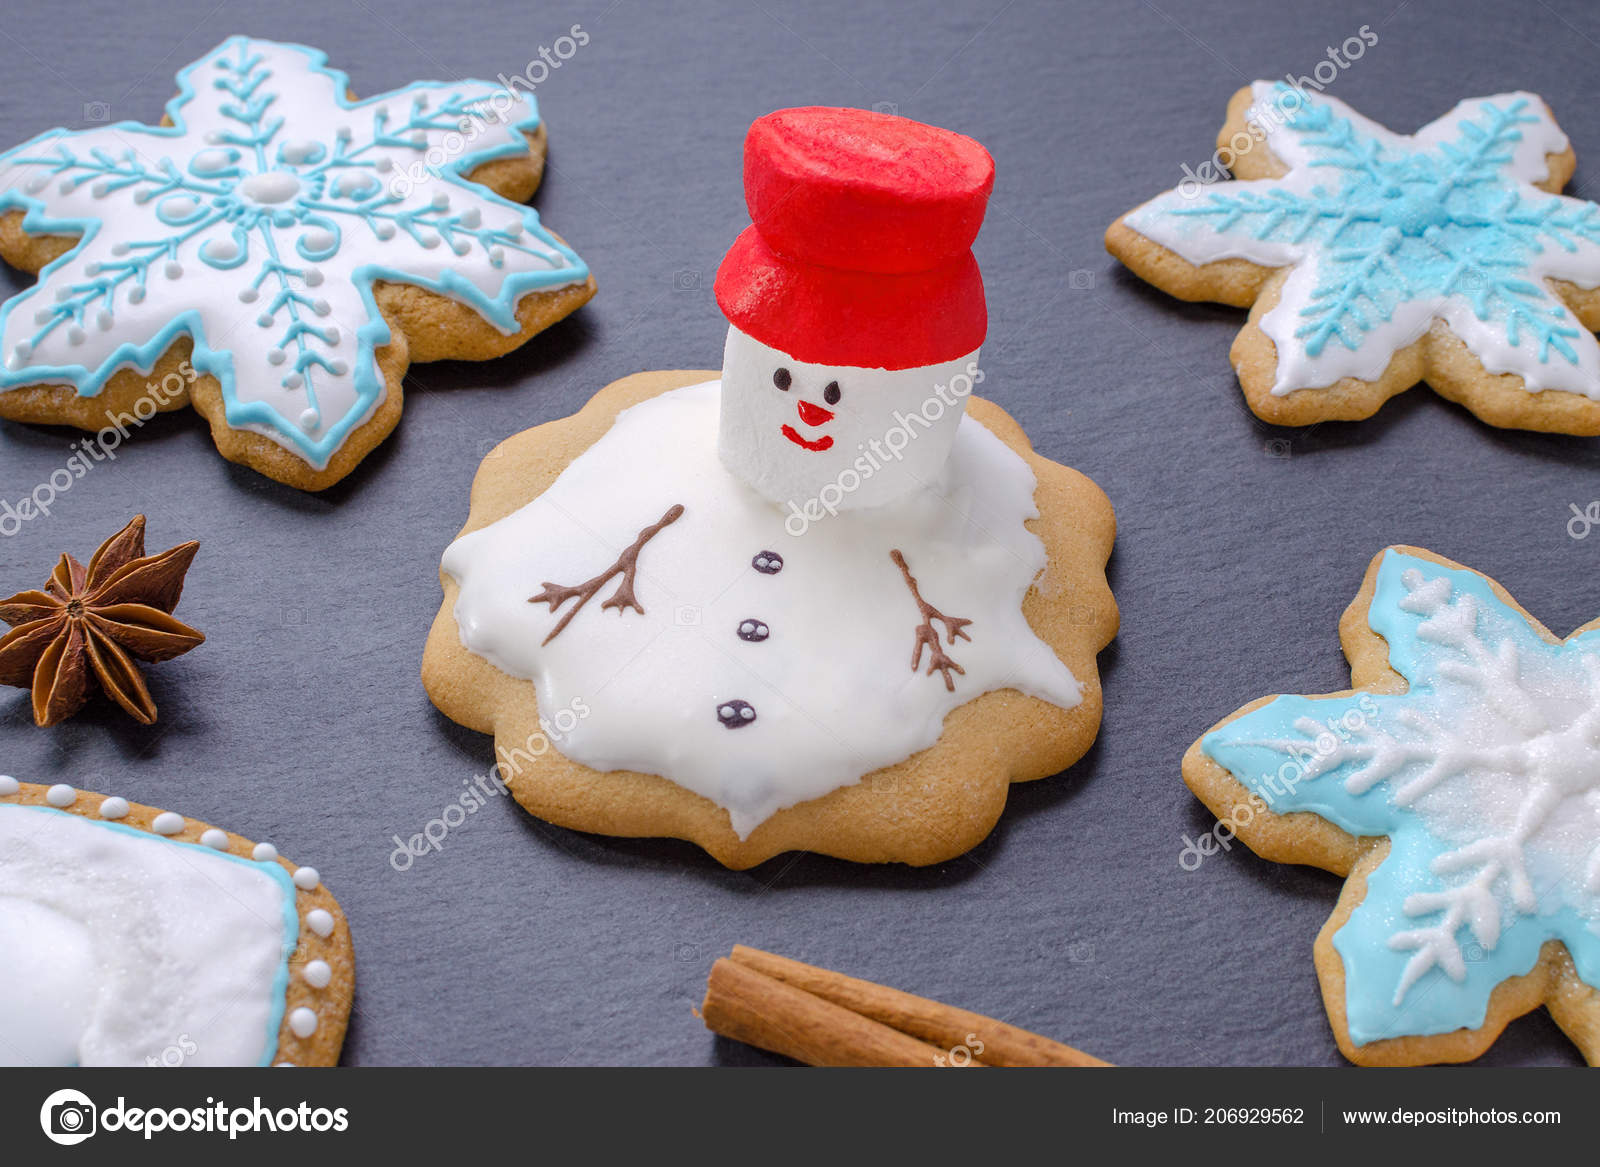 Snowman Gingerbread Cookies Handmade Christmas Cookies Melted